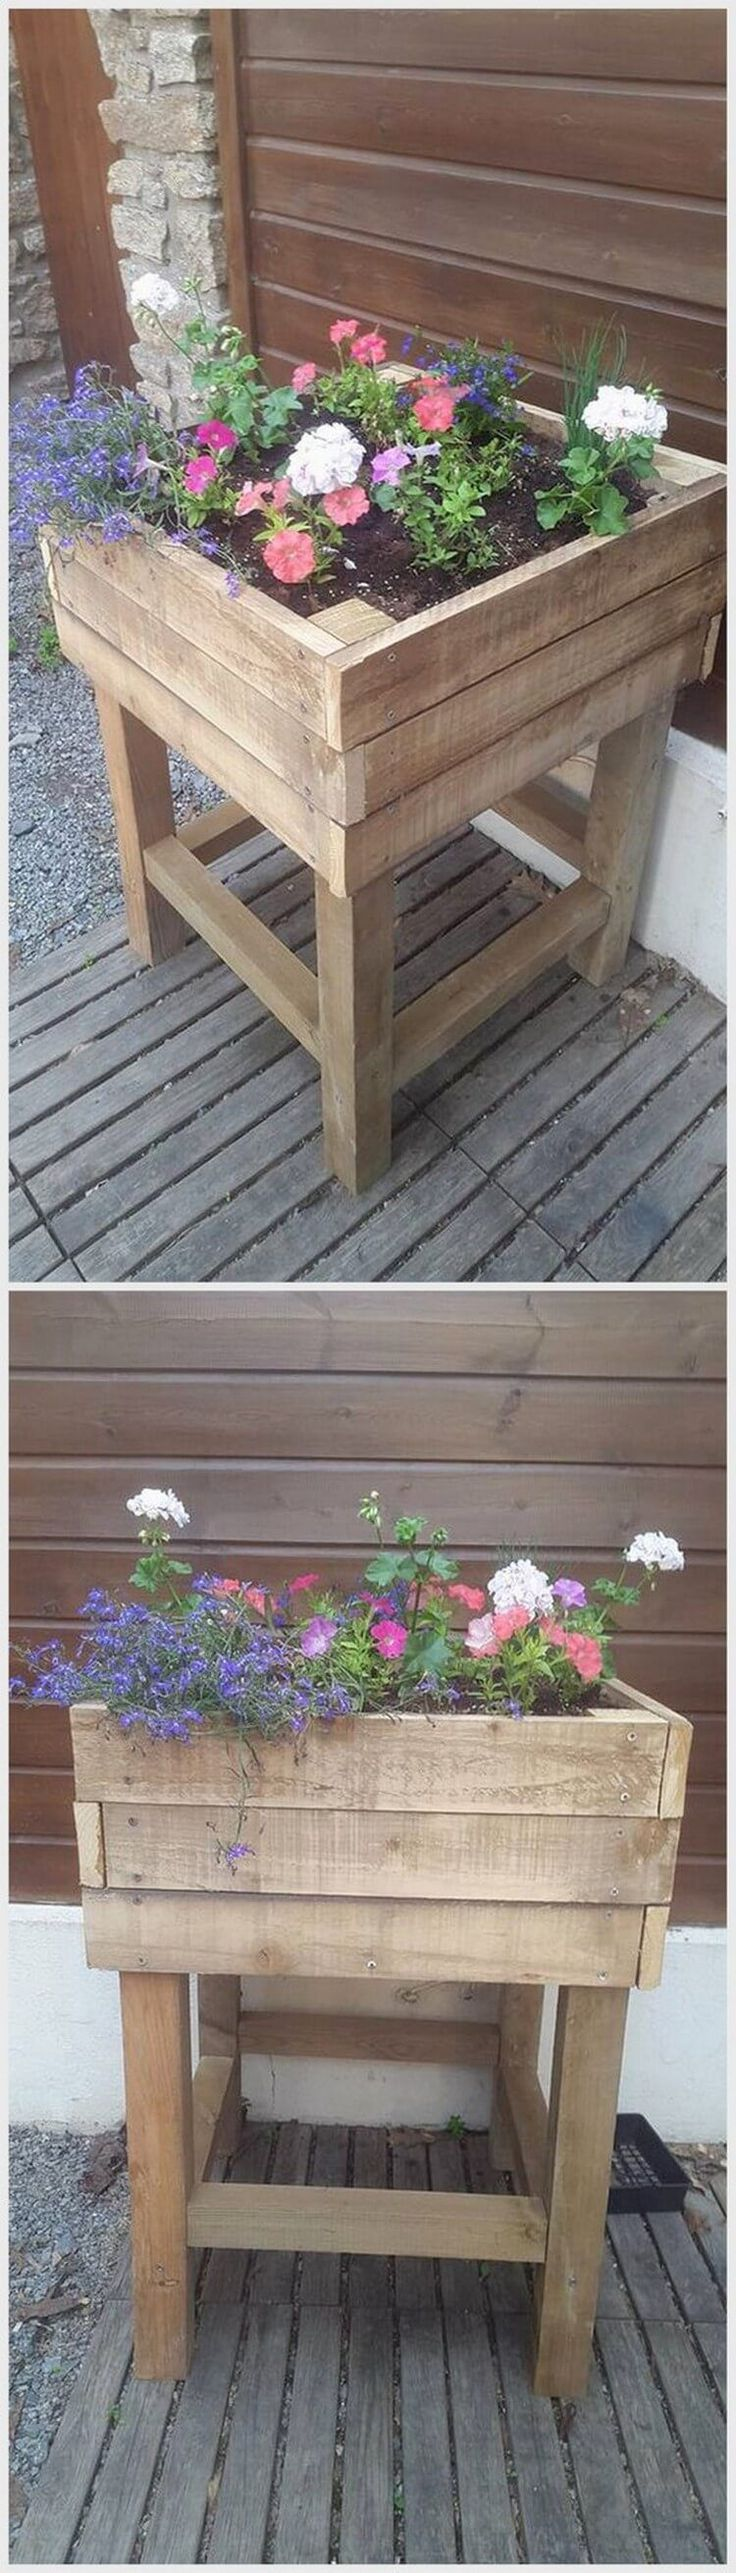 Old Wood Pallet Planter Box #palletfurniturebench